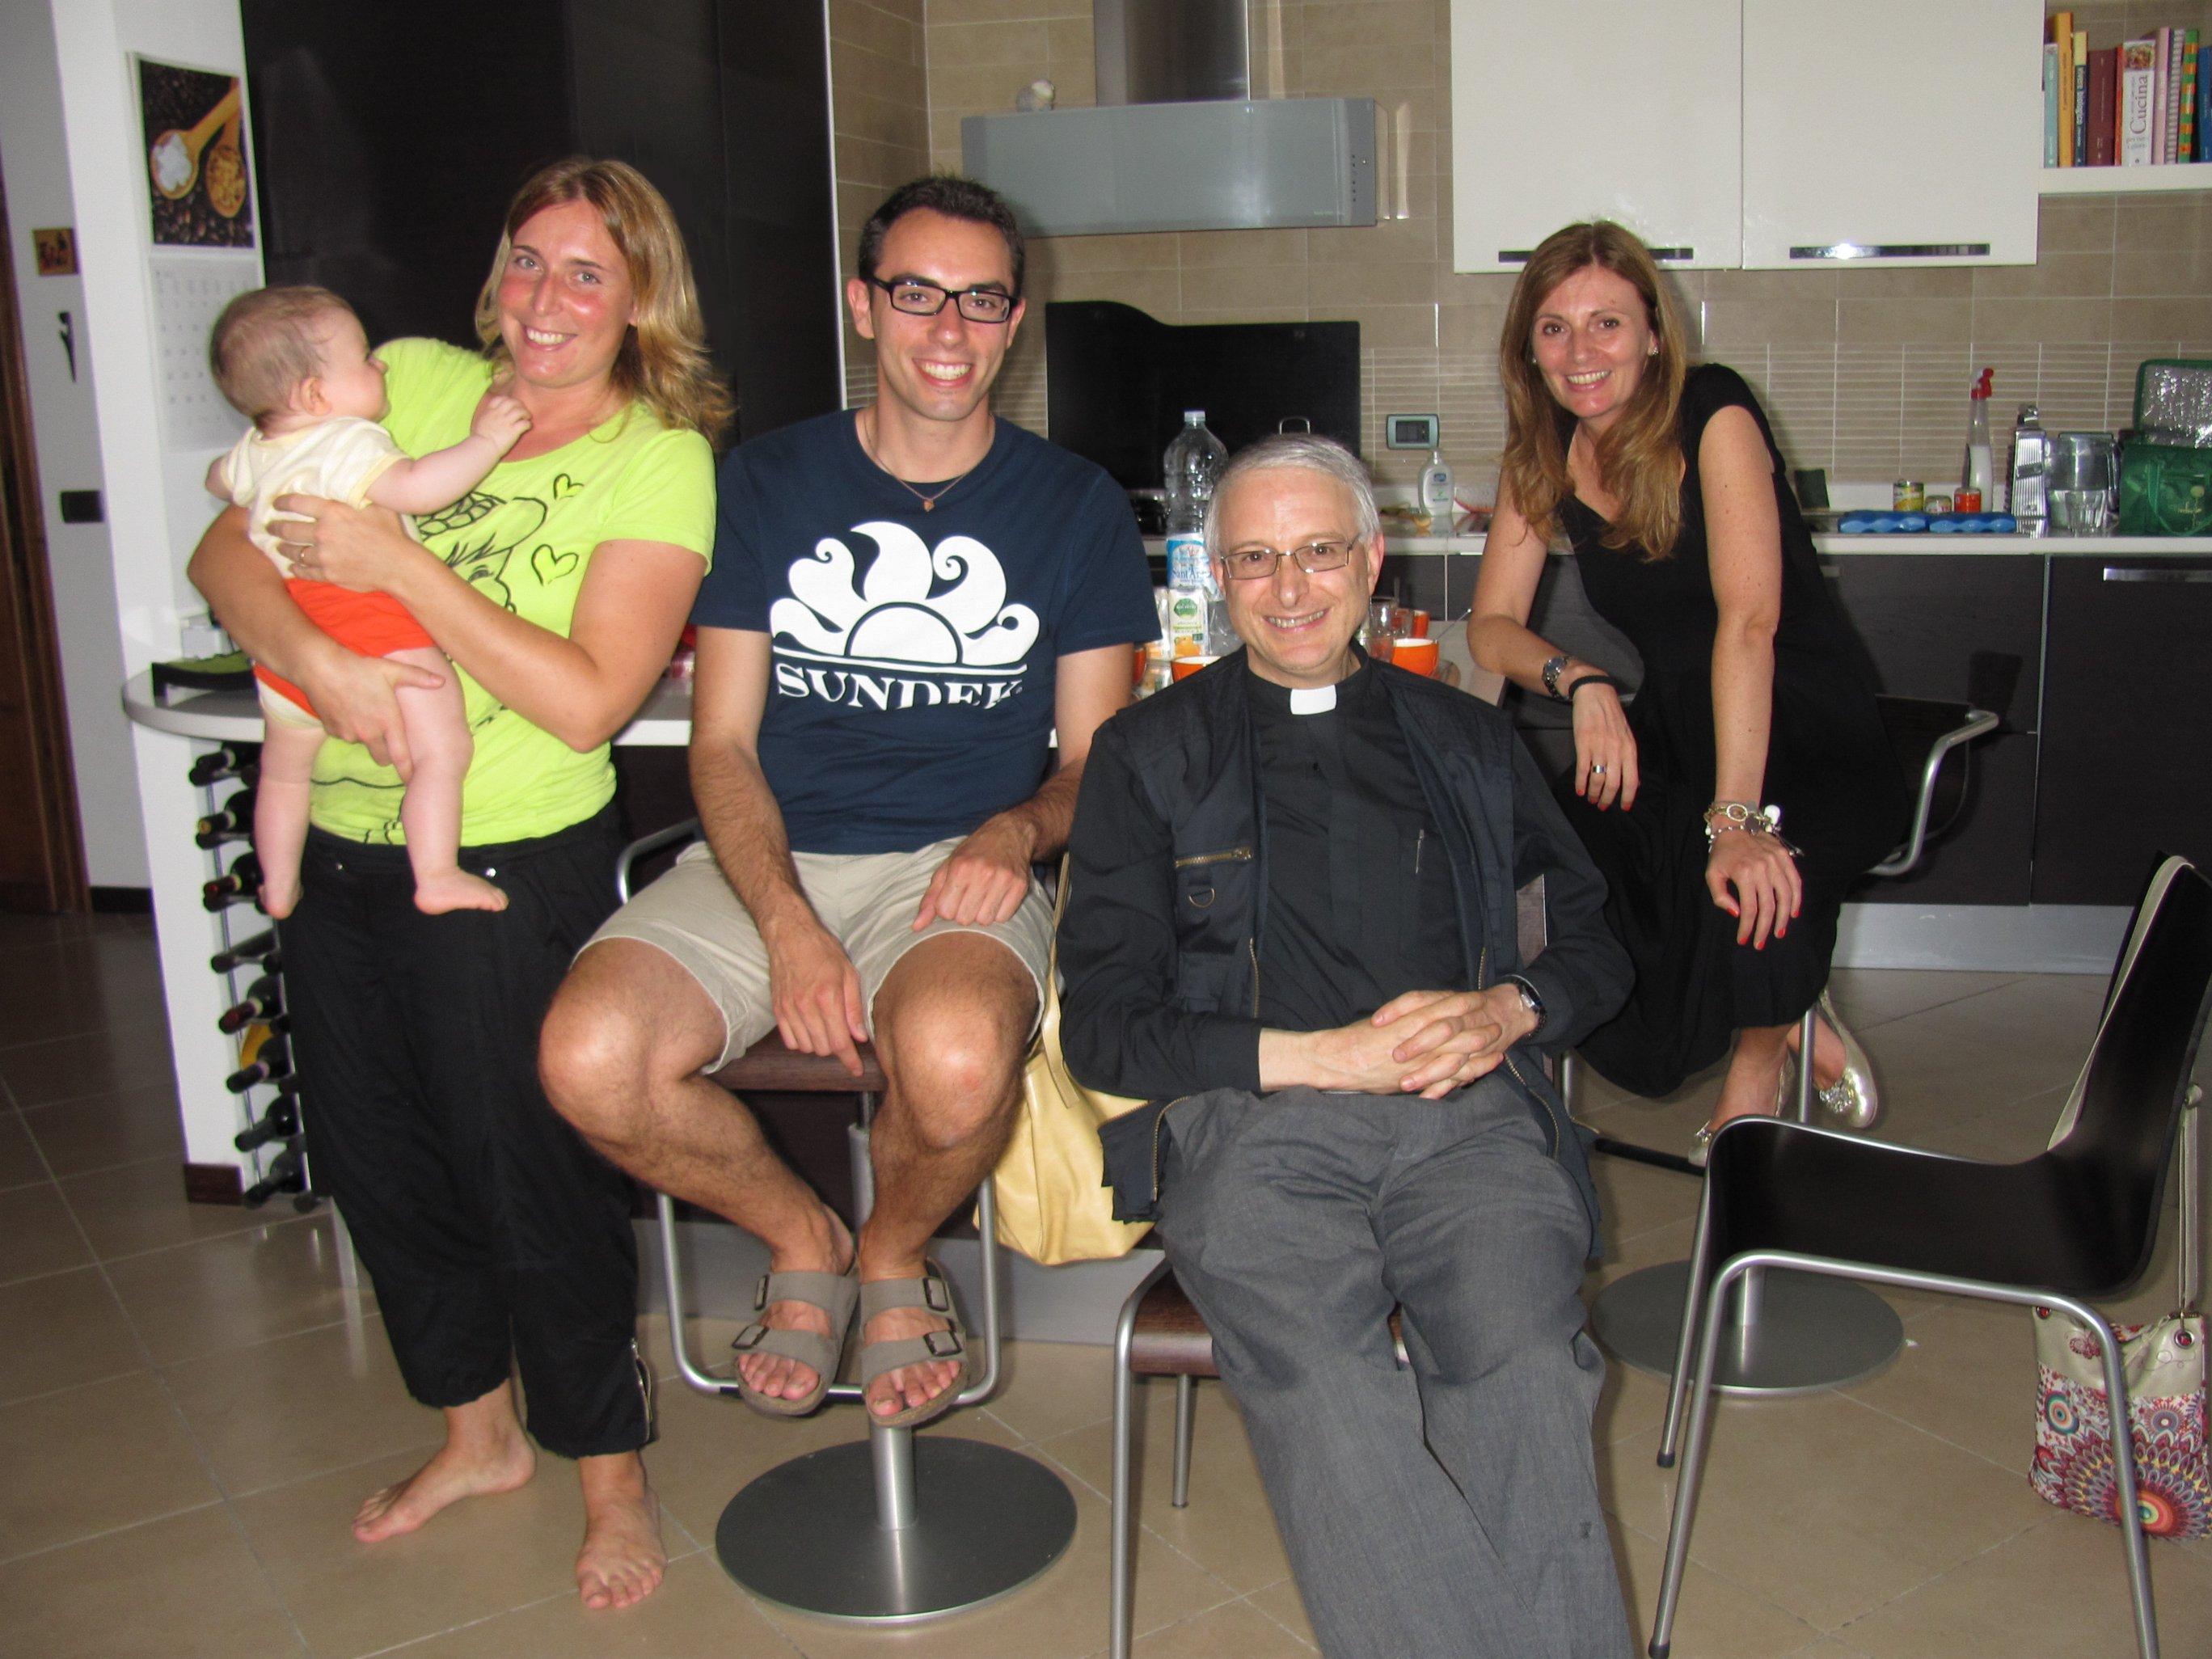 lara_elena_fabrizio_tiziana_2013-07-17-19-32-34